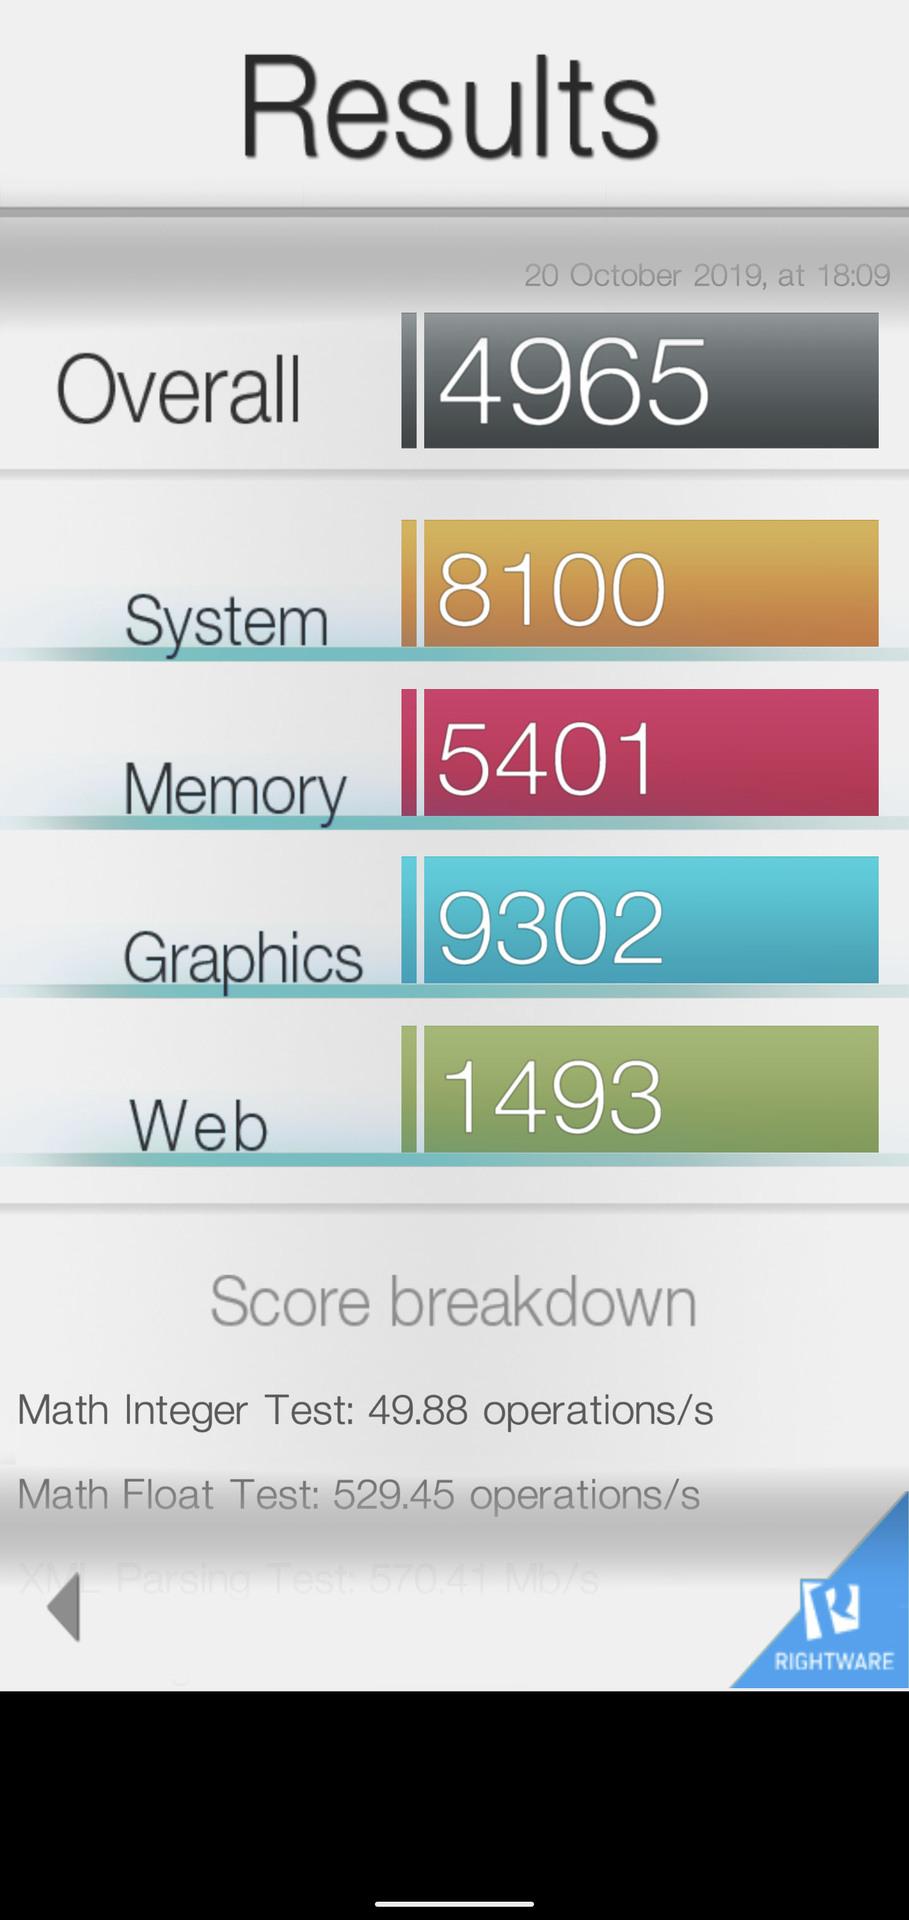 Google Pixel 4 XL Basemark benchmark results